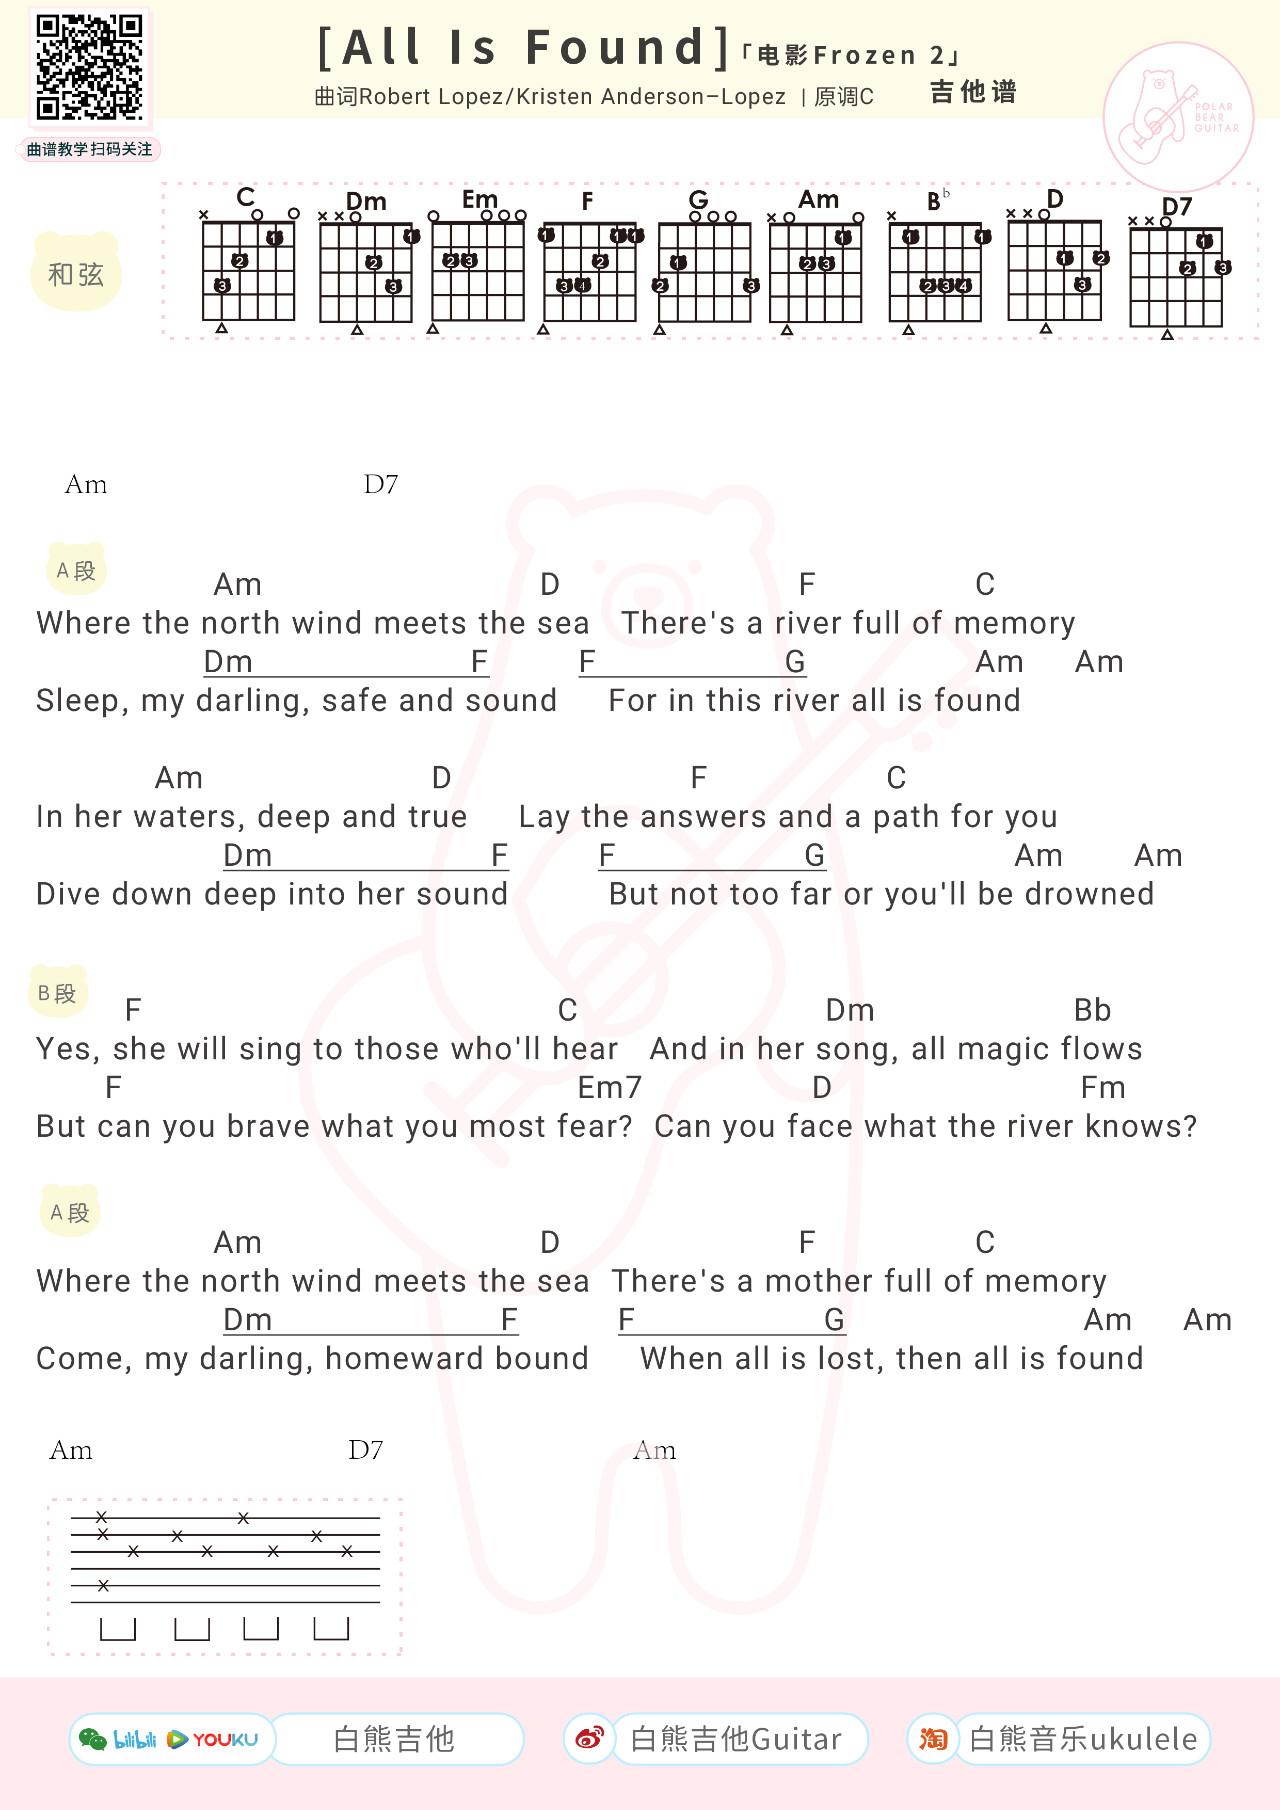 《All Is Found》吉他弹唱谱